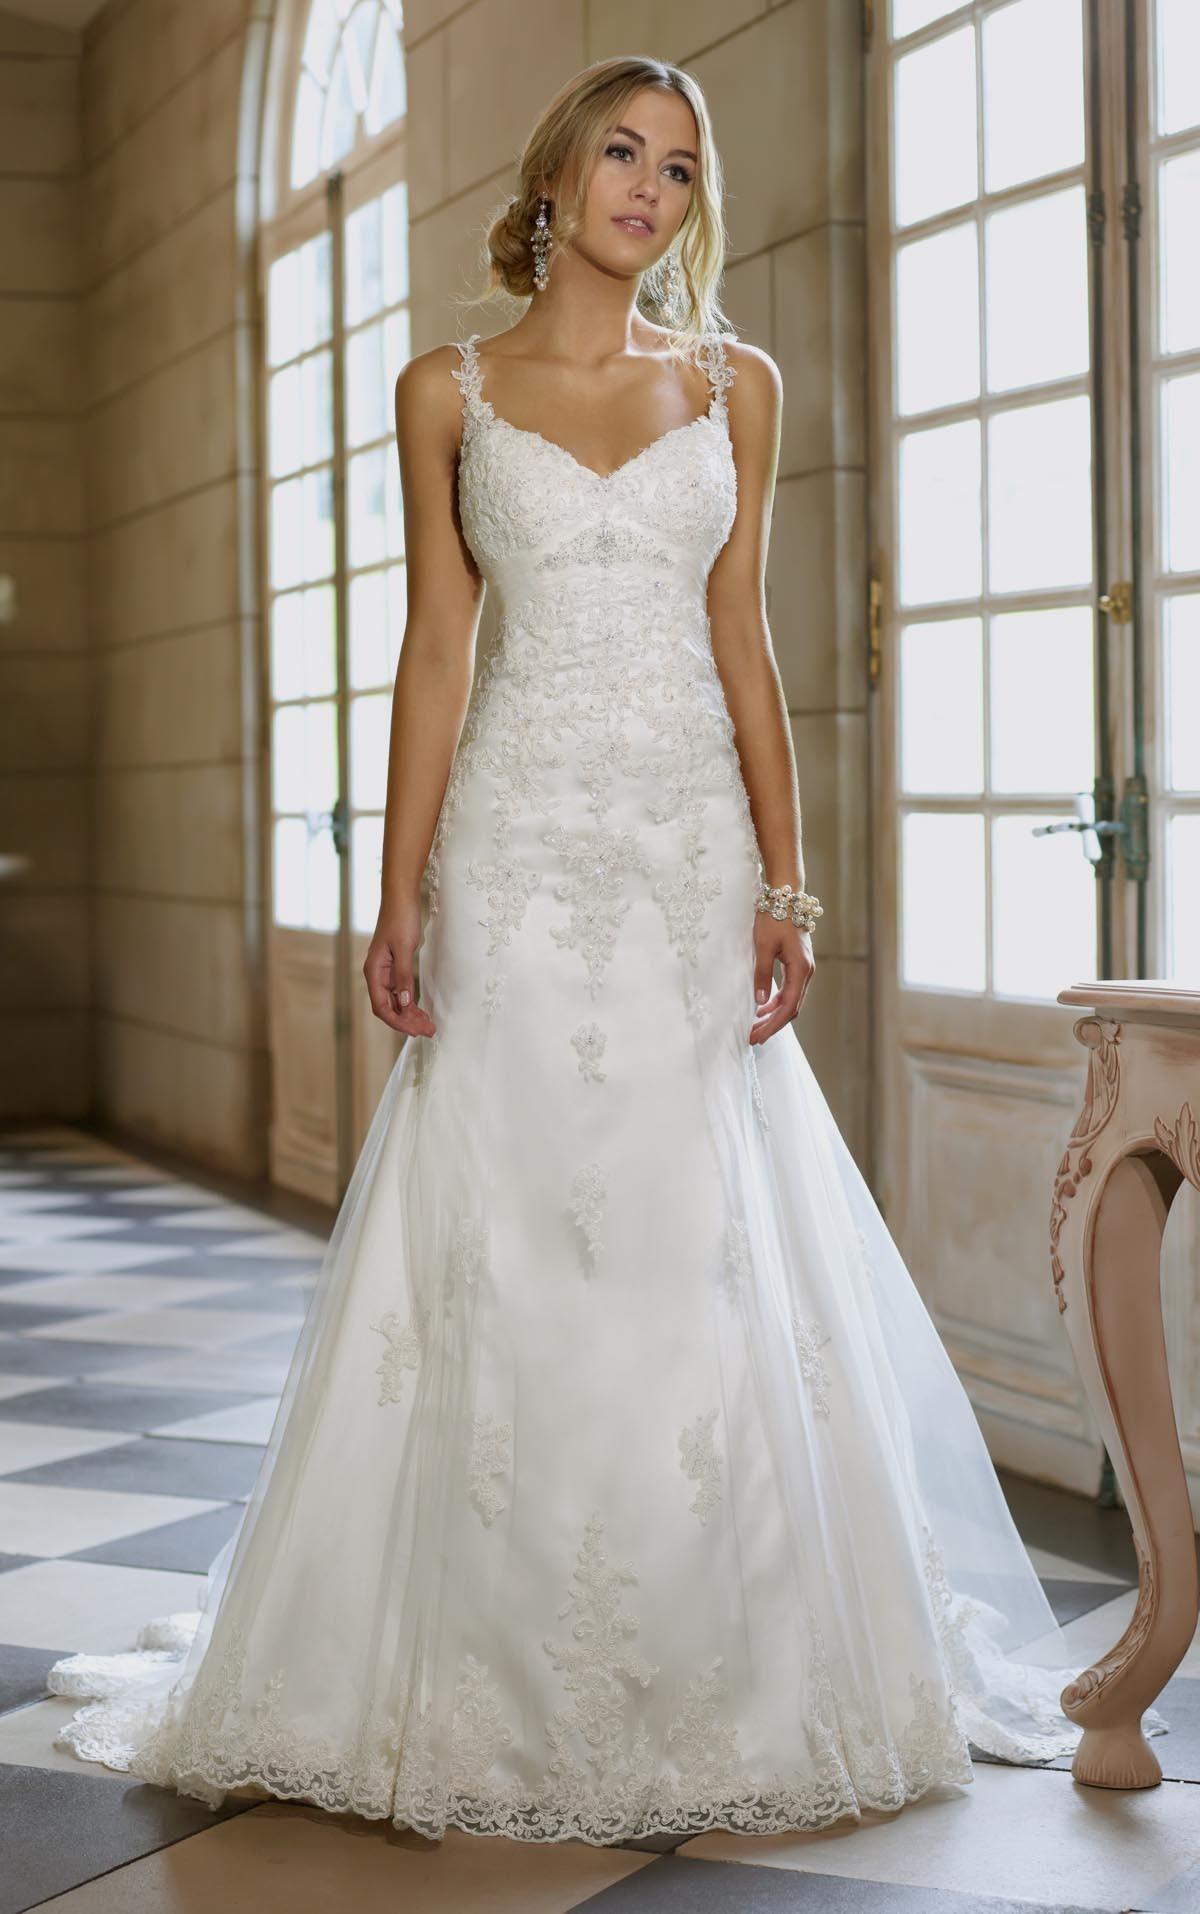 Spaghetti Strap A Line Wedding Dress  a line wedding dress with lace straps Naf Dresses